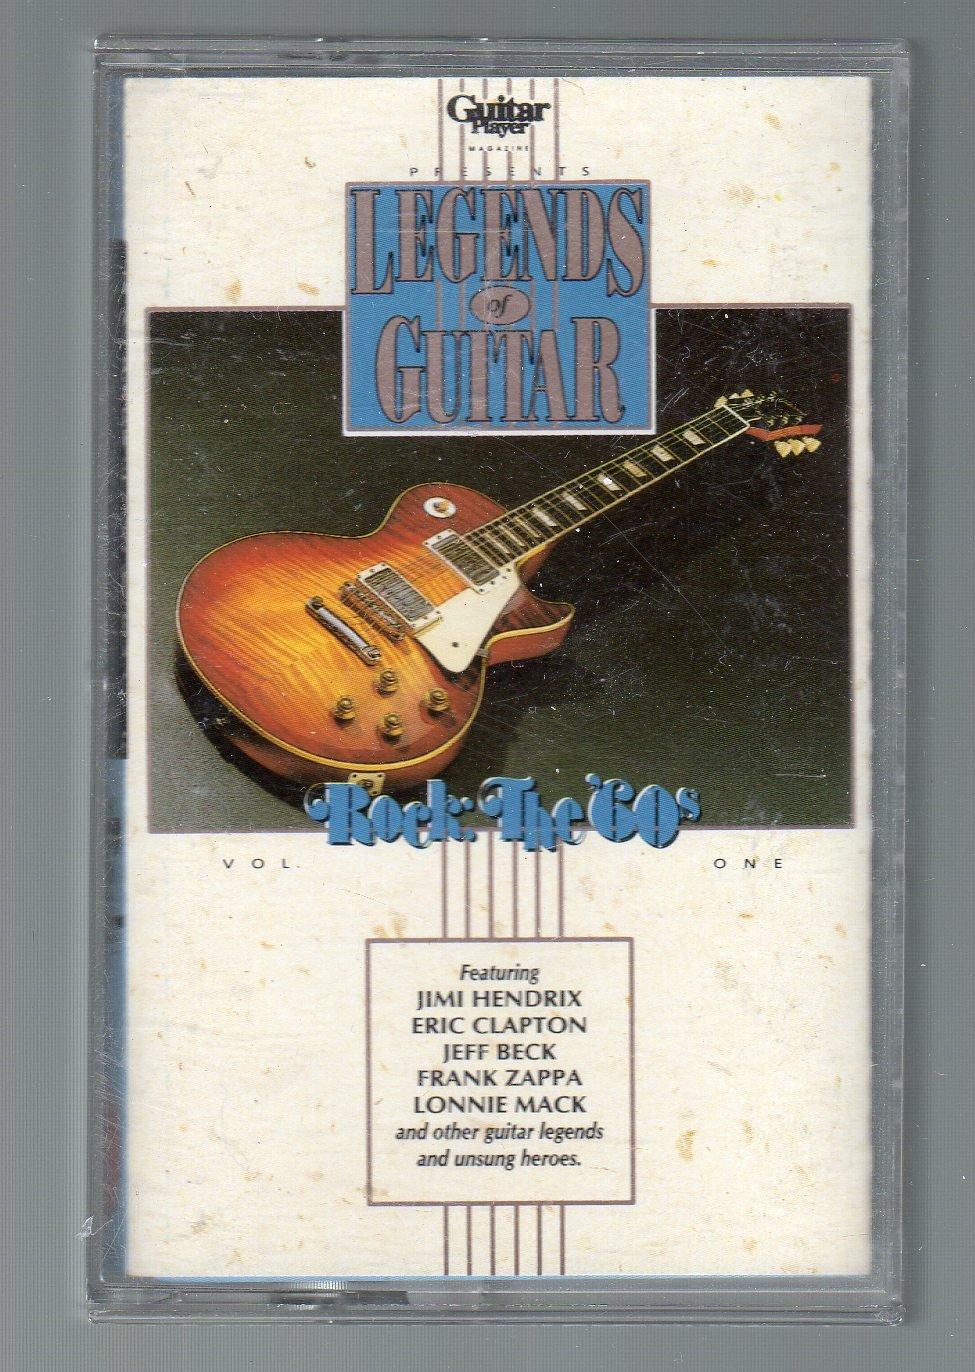 Legends Of Guitar - Rock The 60's Vol 1 RHINO Cassette Tape